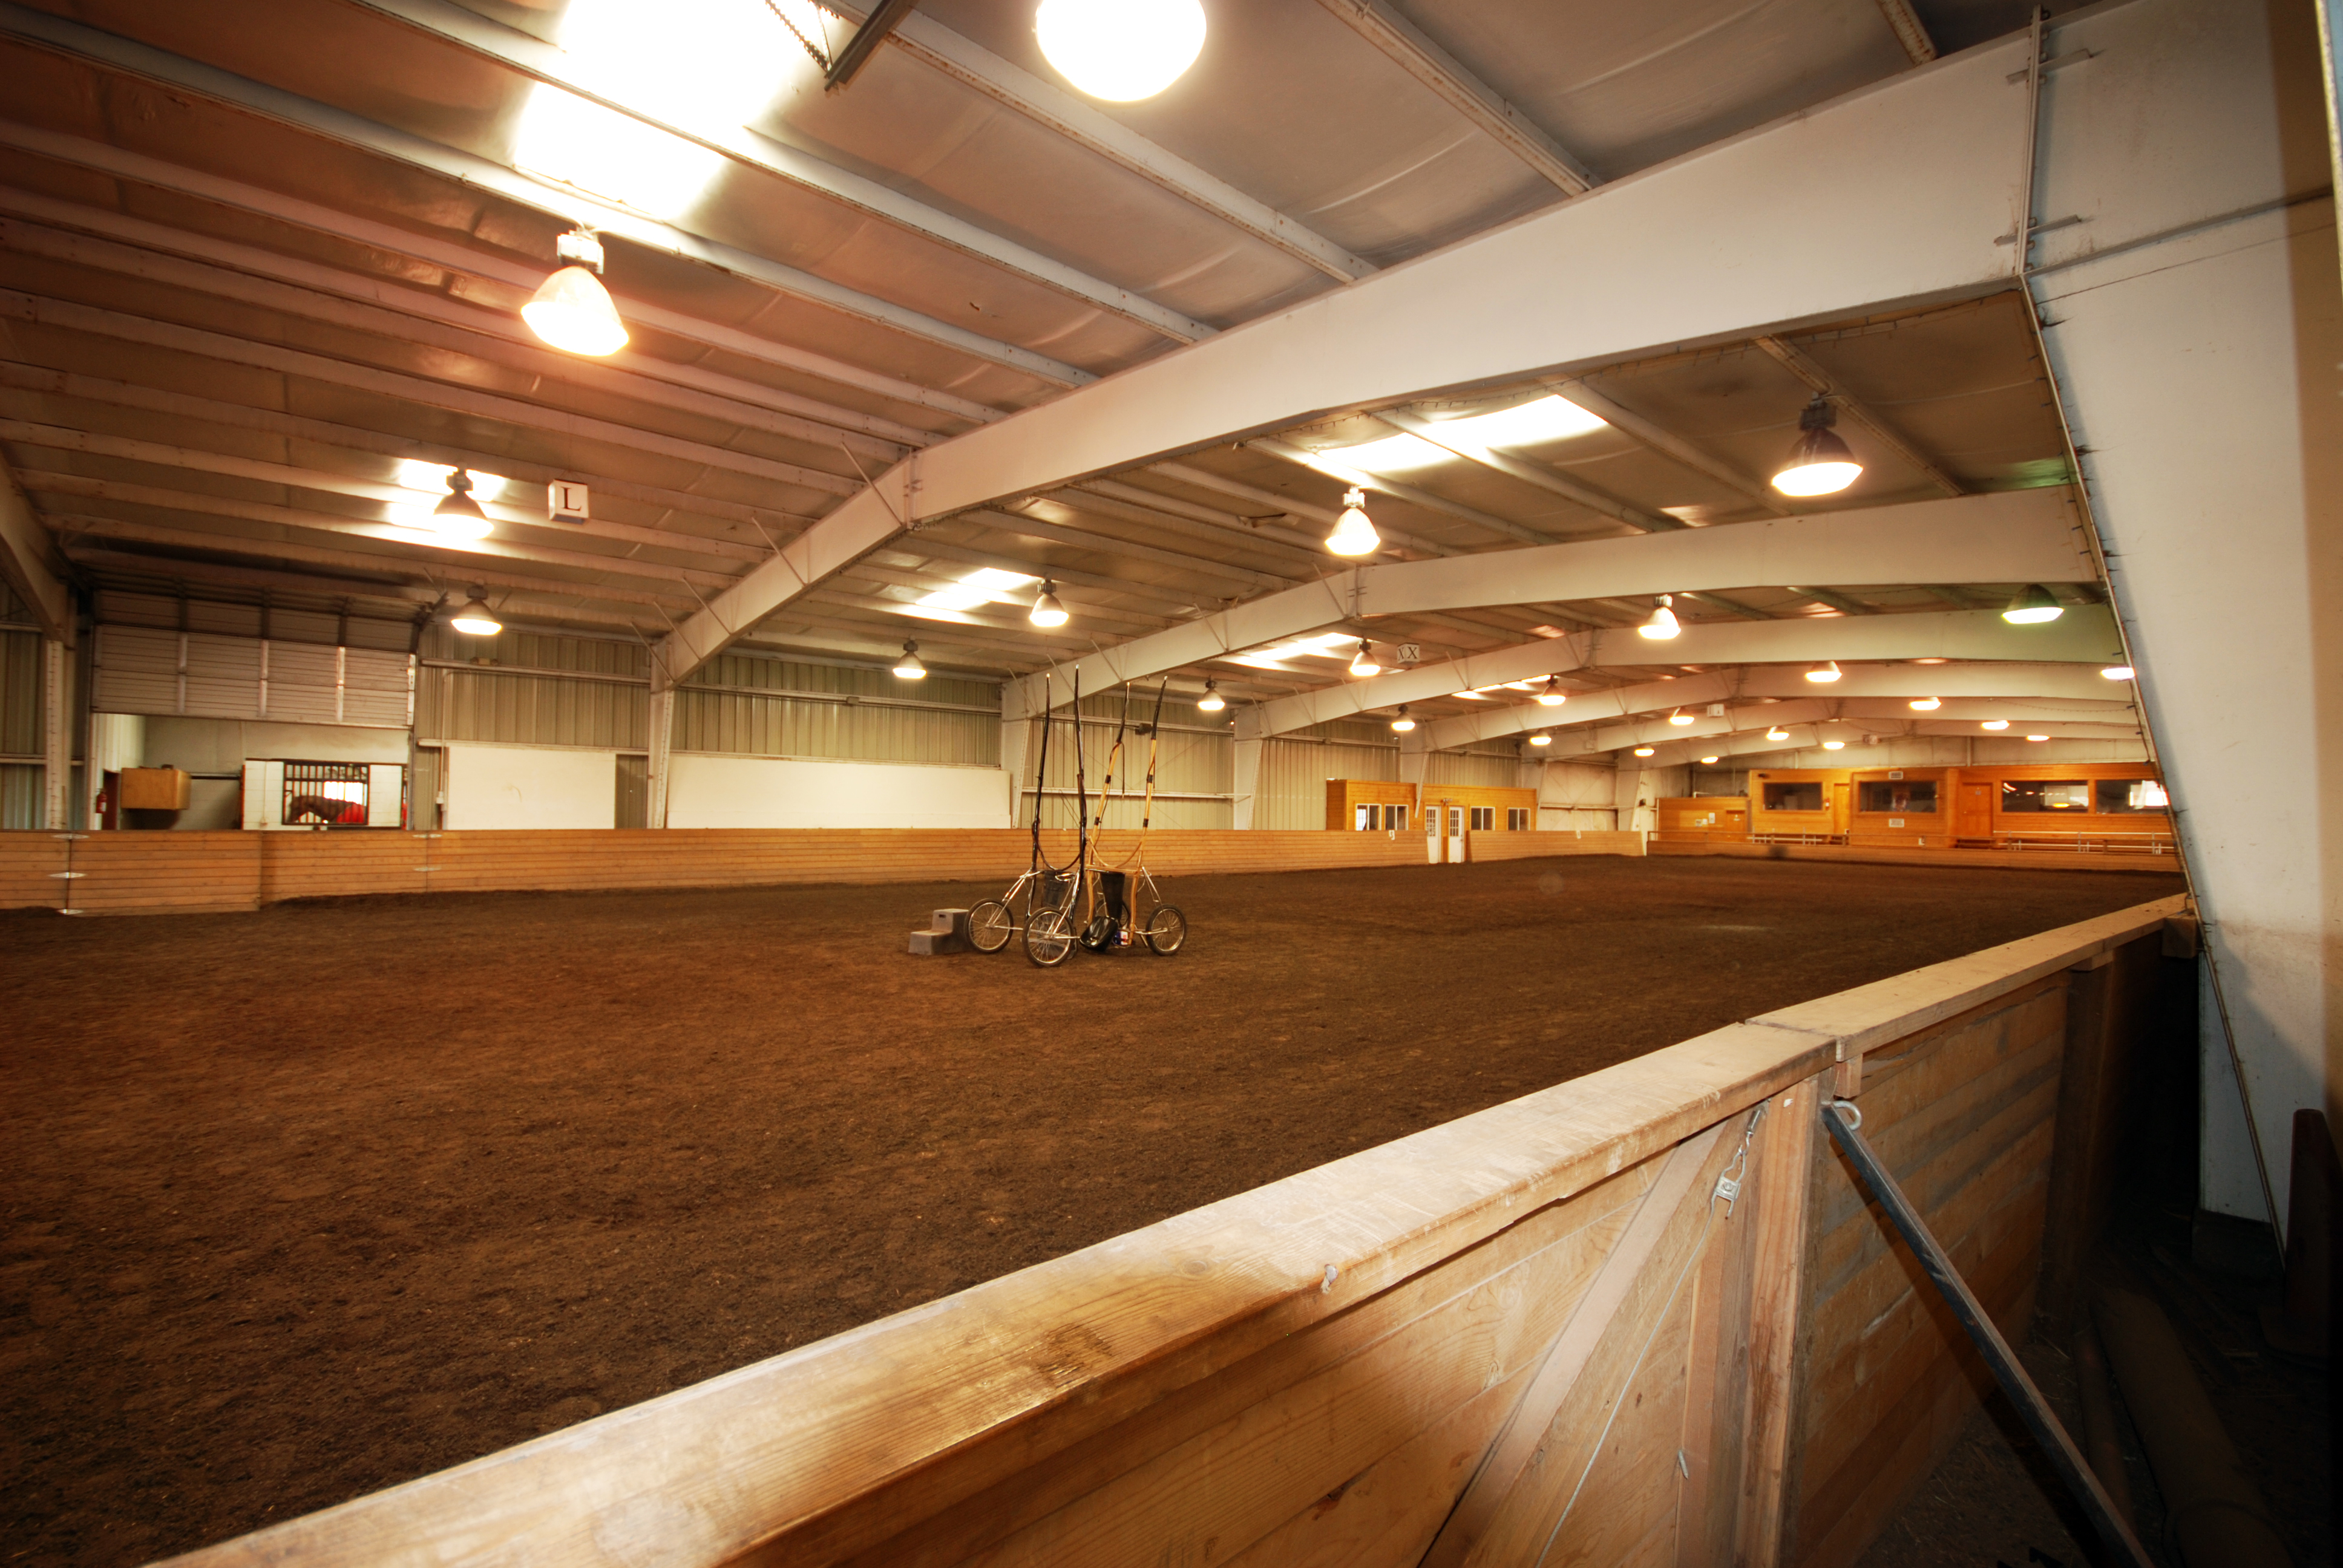 Elizabeth Indoor Equestrian Arena